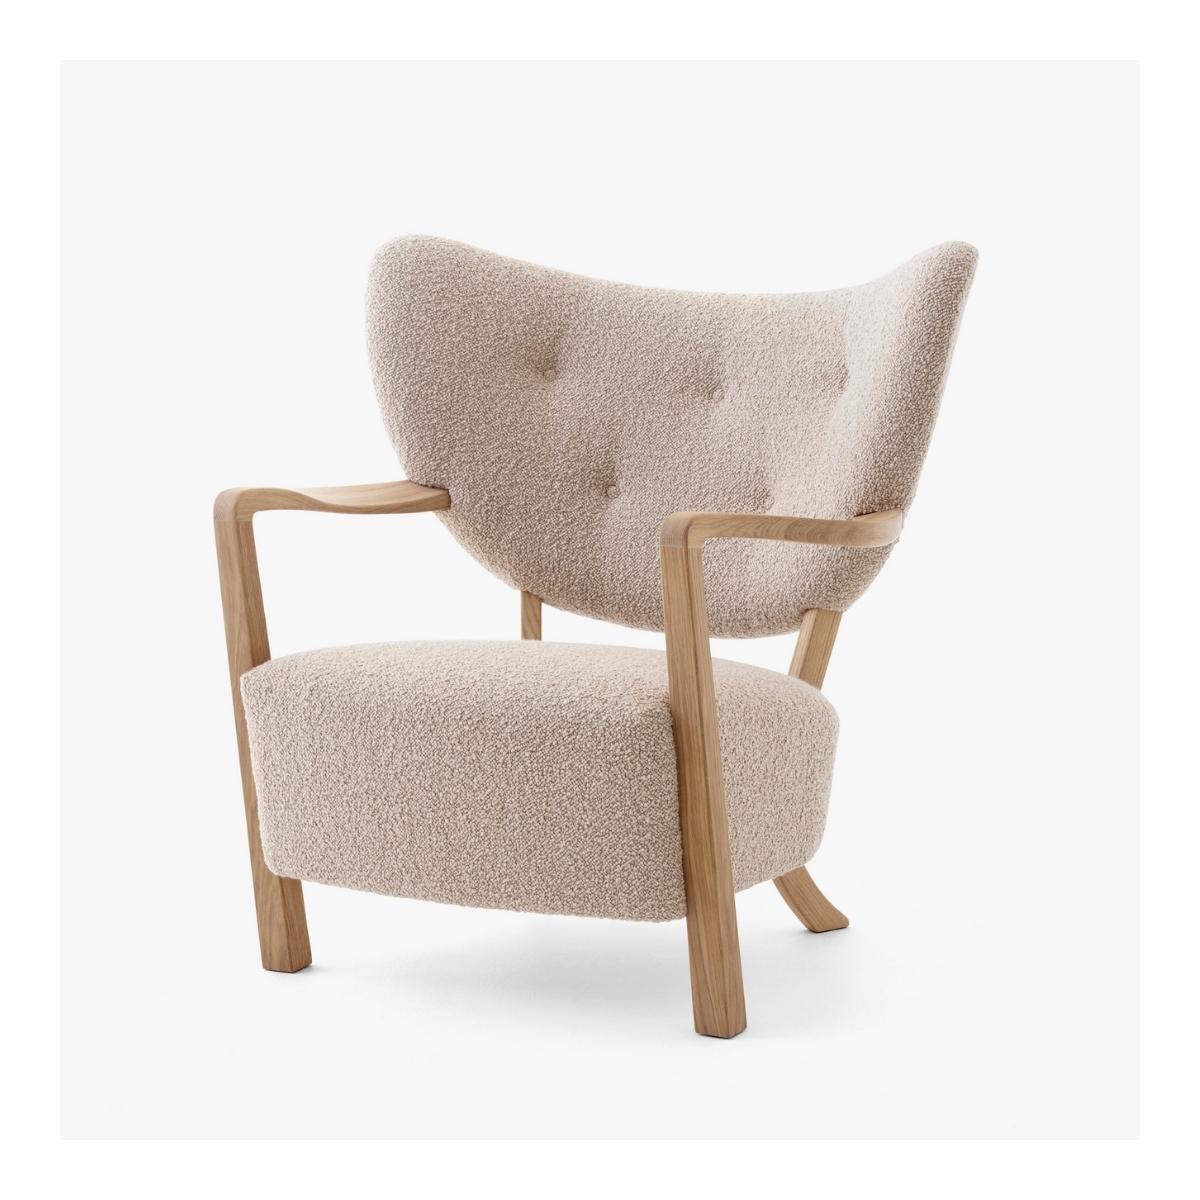 &Tradition   Wulff ATD2 Lounge Chair - Bolighuset Werenberg